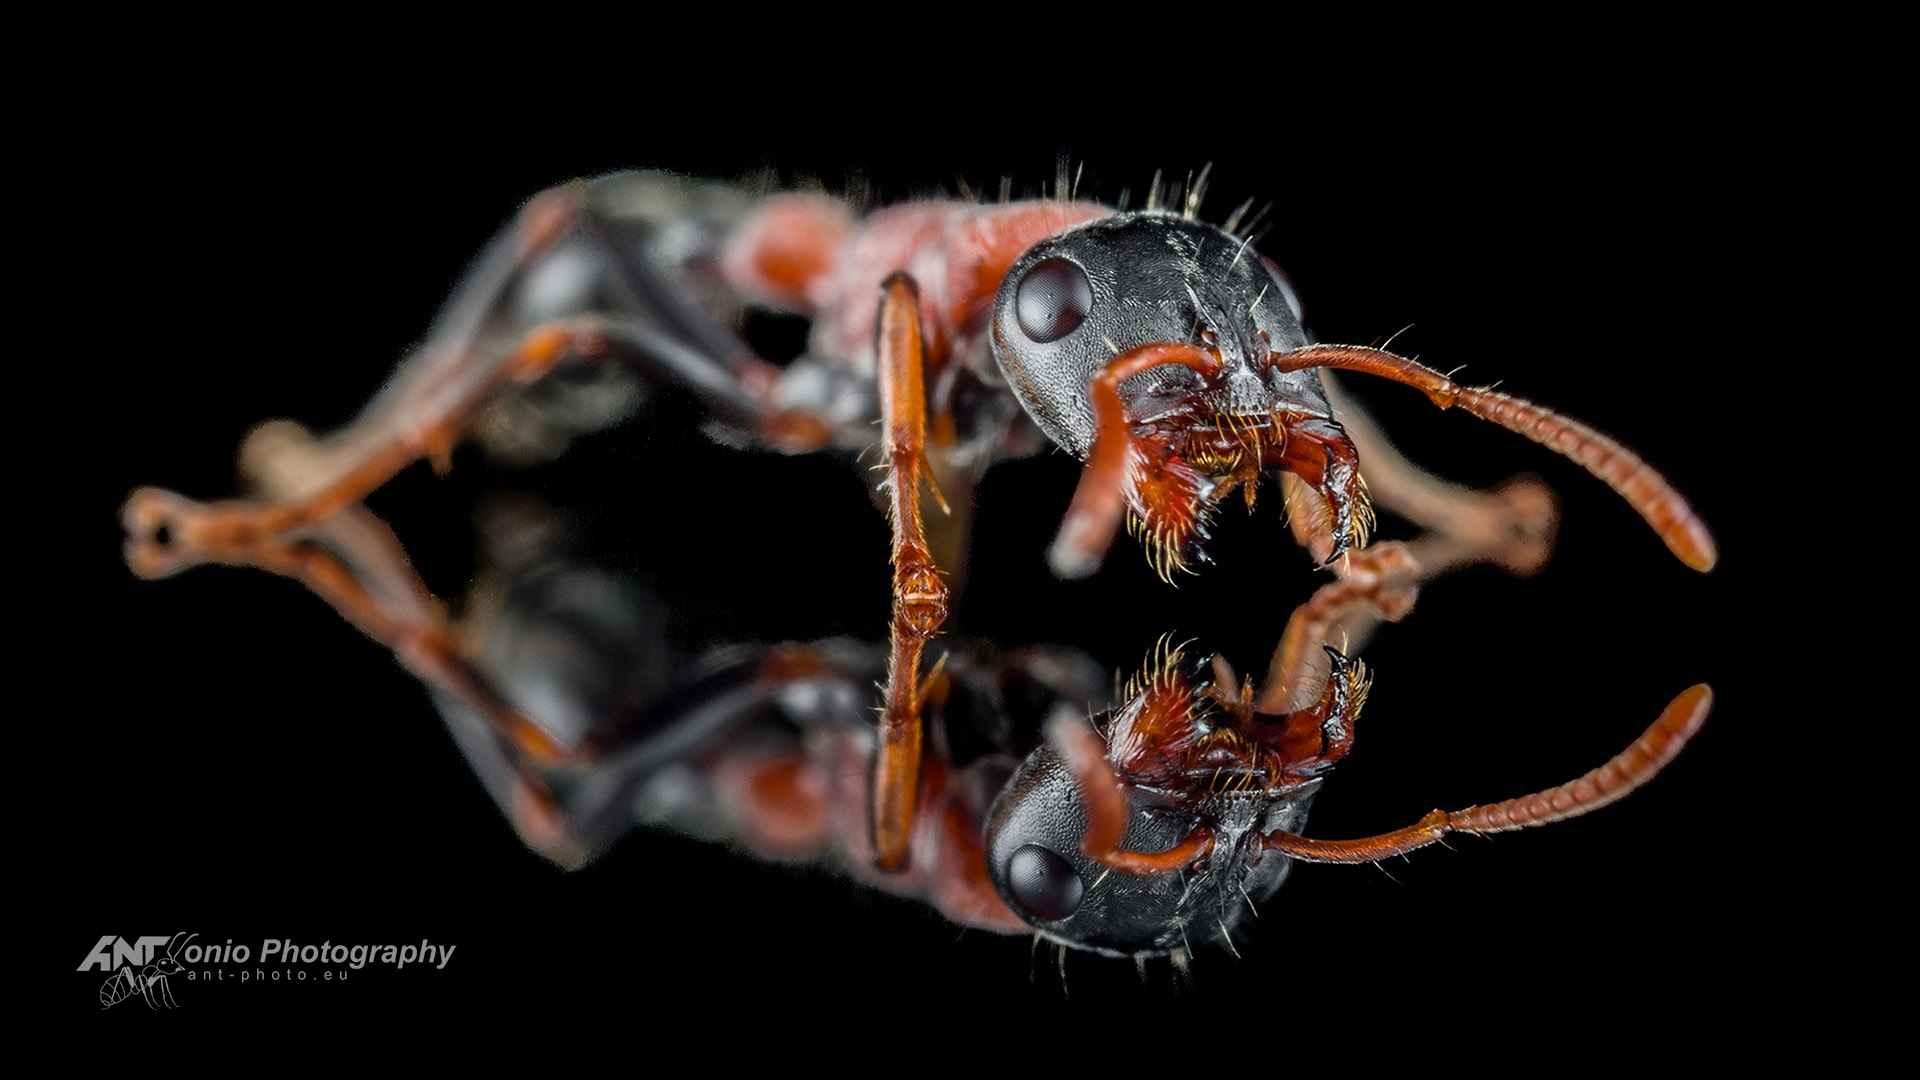 Ant Tetraponera rufonigra